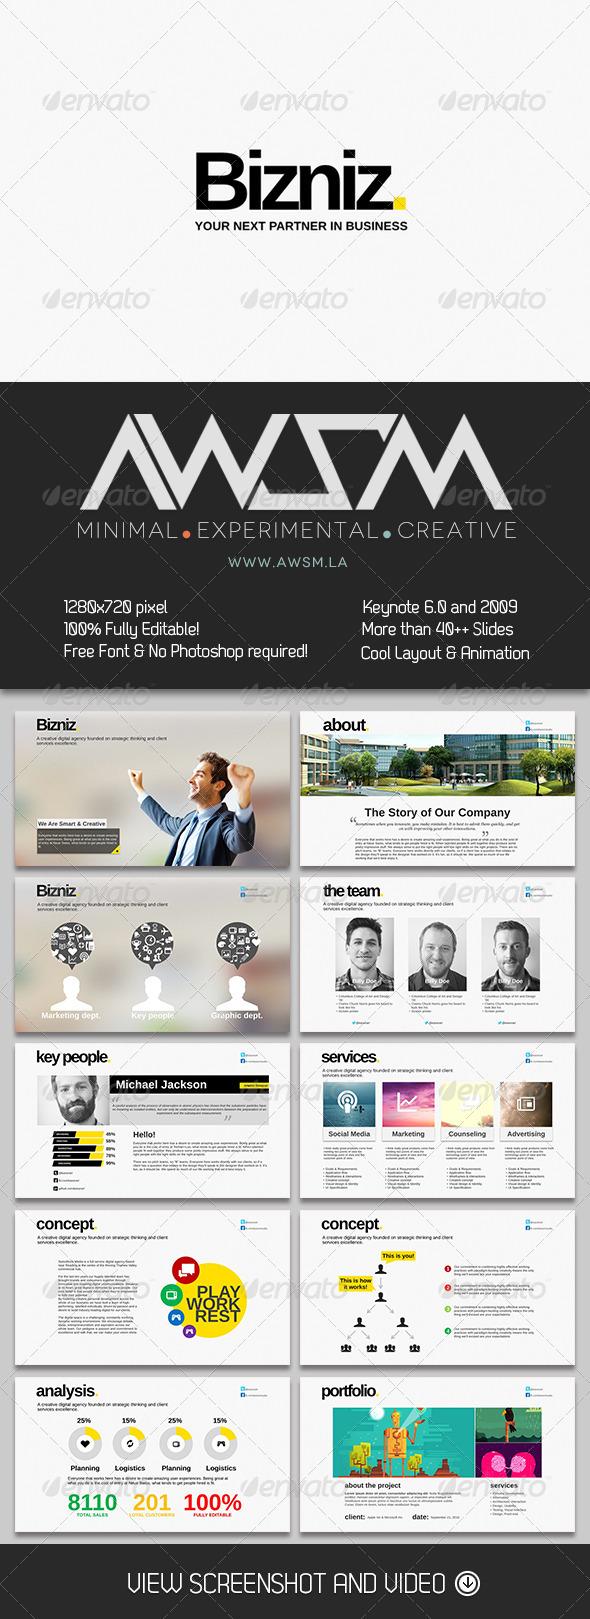 GraphicRiver Bizniz Keynote Template 6361466